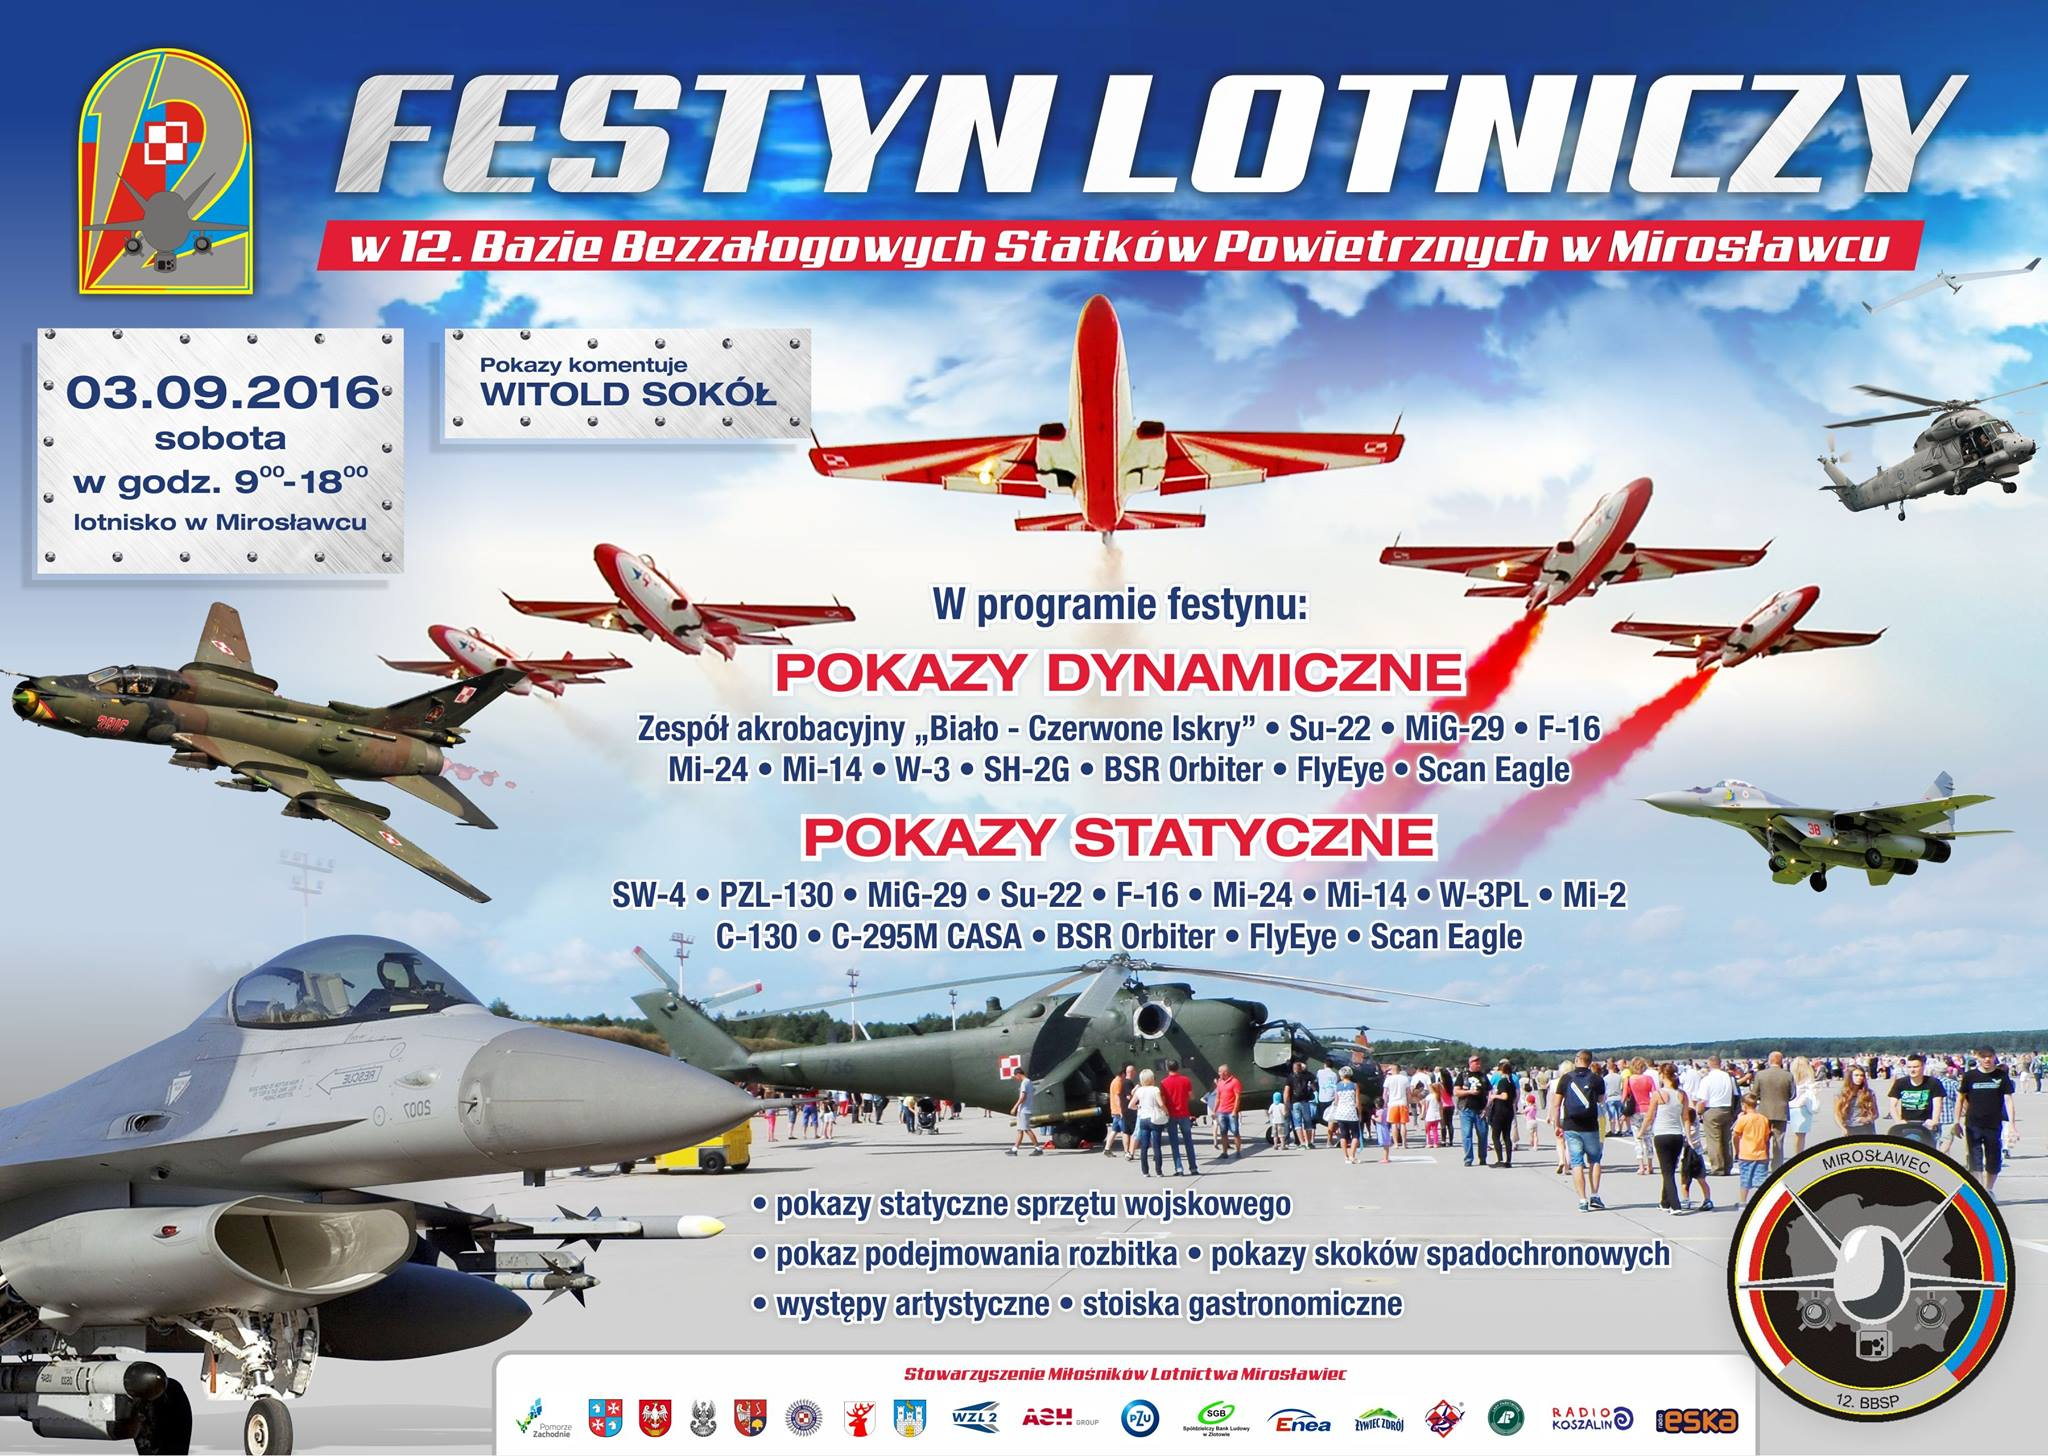 Festyn 12 BBSP Mirosławiec - plakat